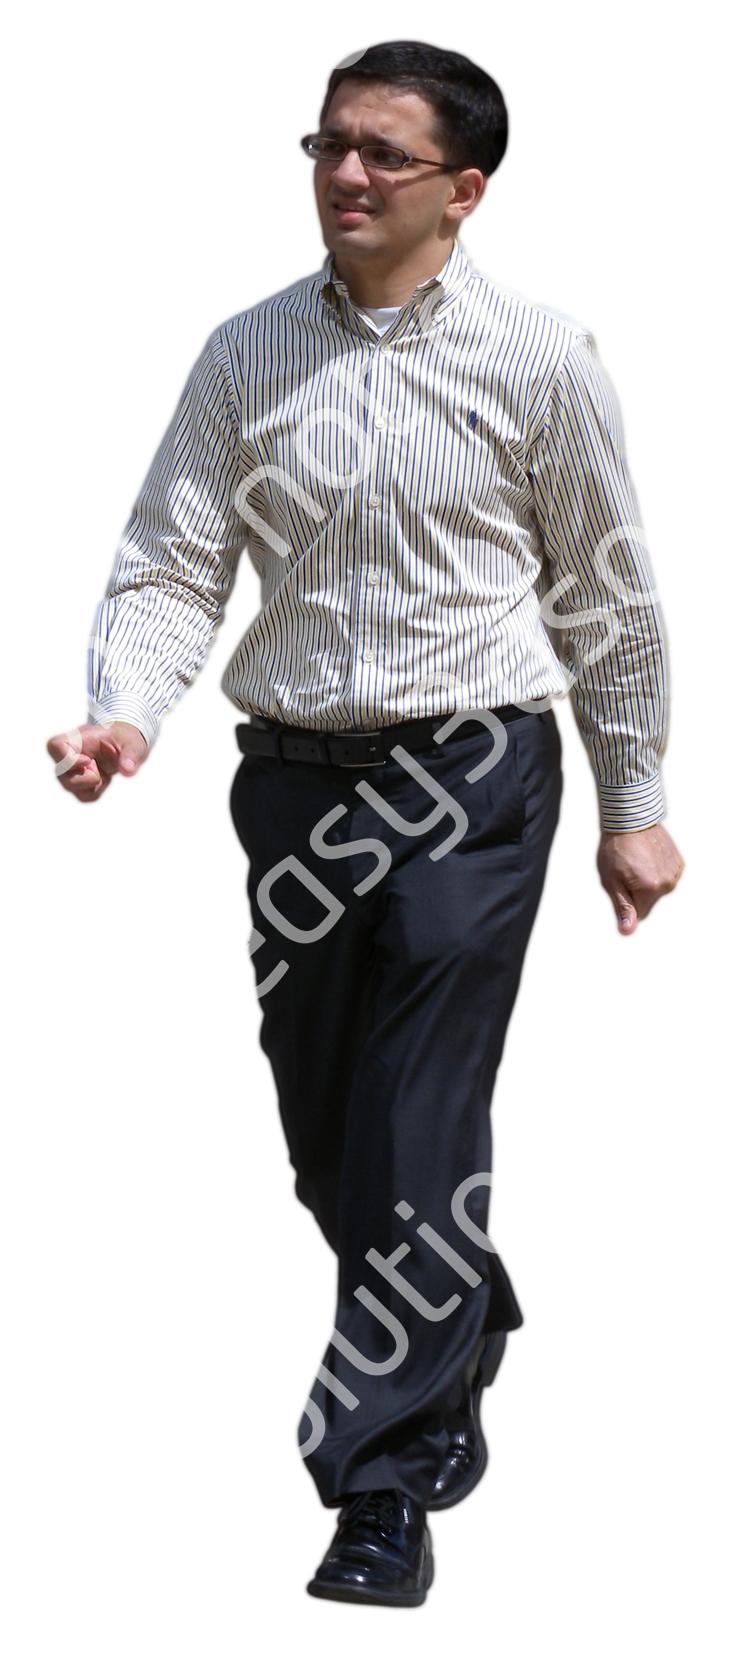 (Single) Business People V. 1 #038 man, walking